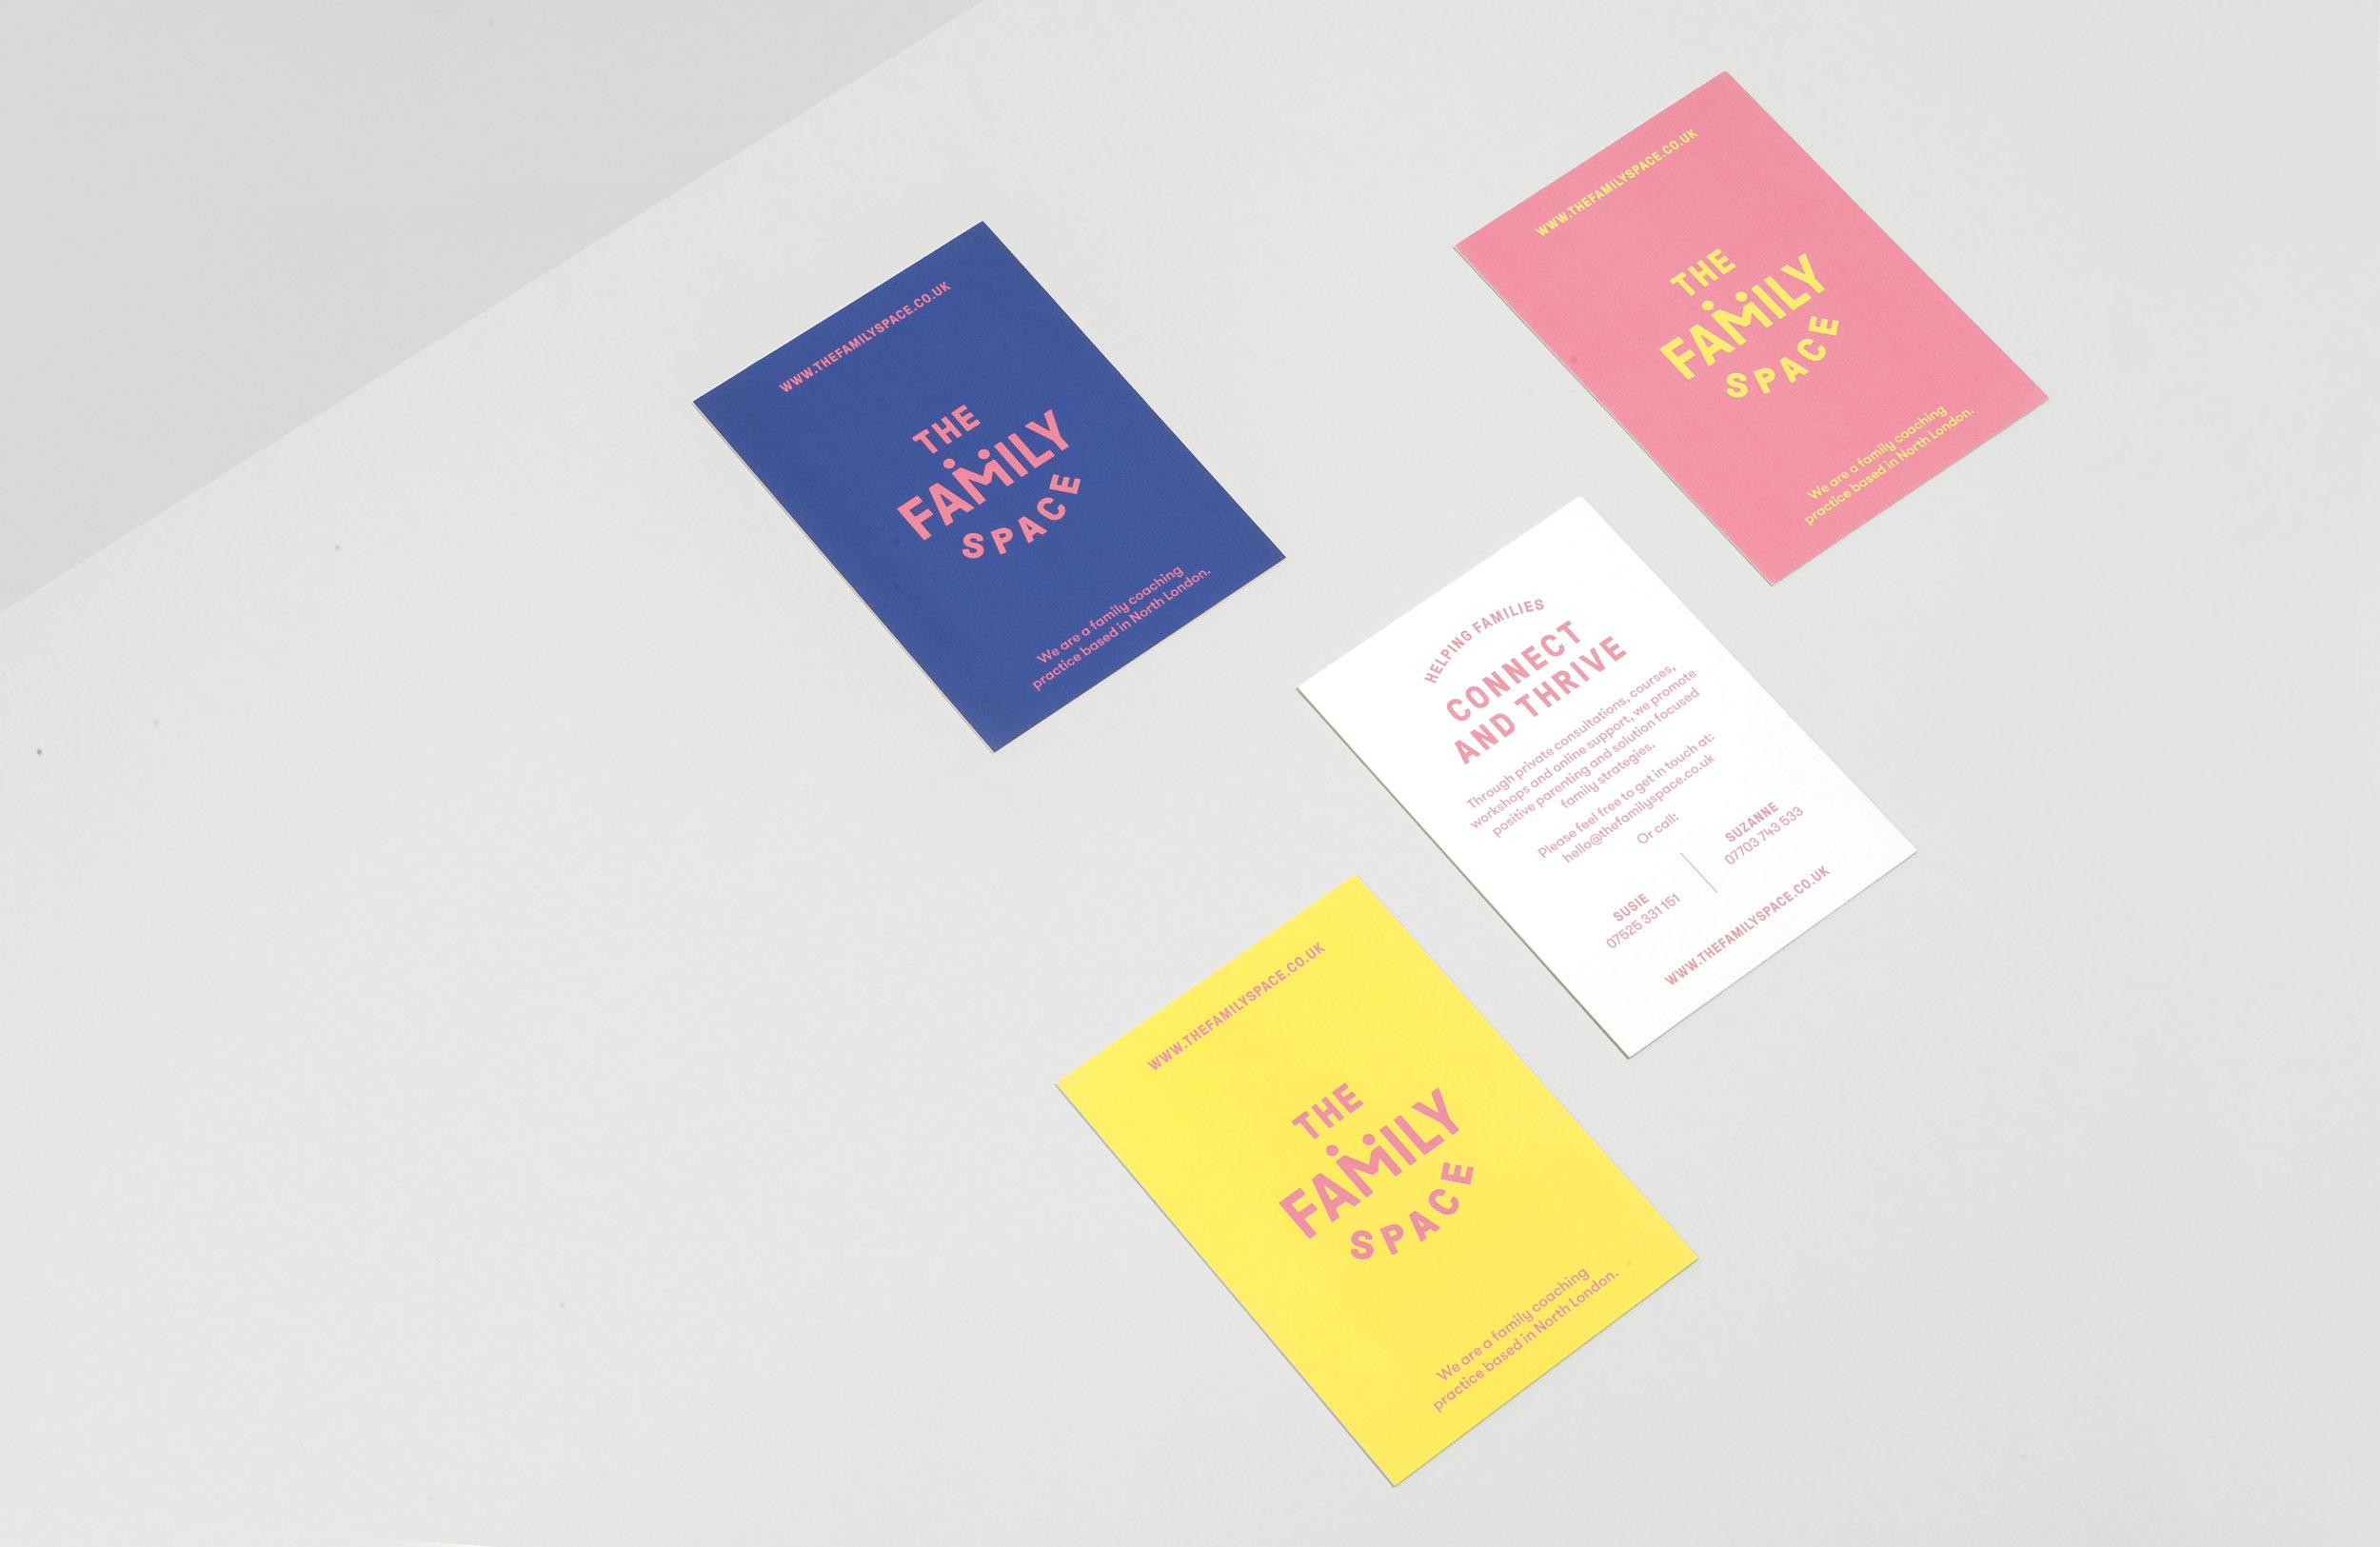 All Works Co._Graphic_Design_Studio_London_TheFamilySpace_Identity_Print_Postcard02